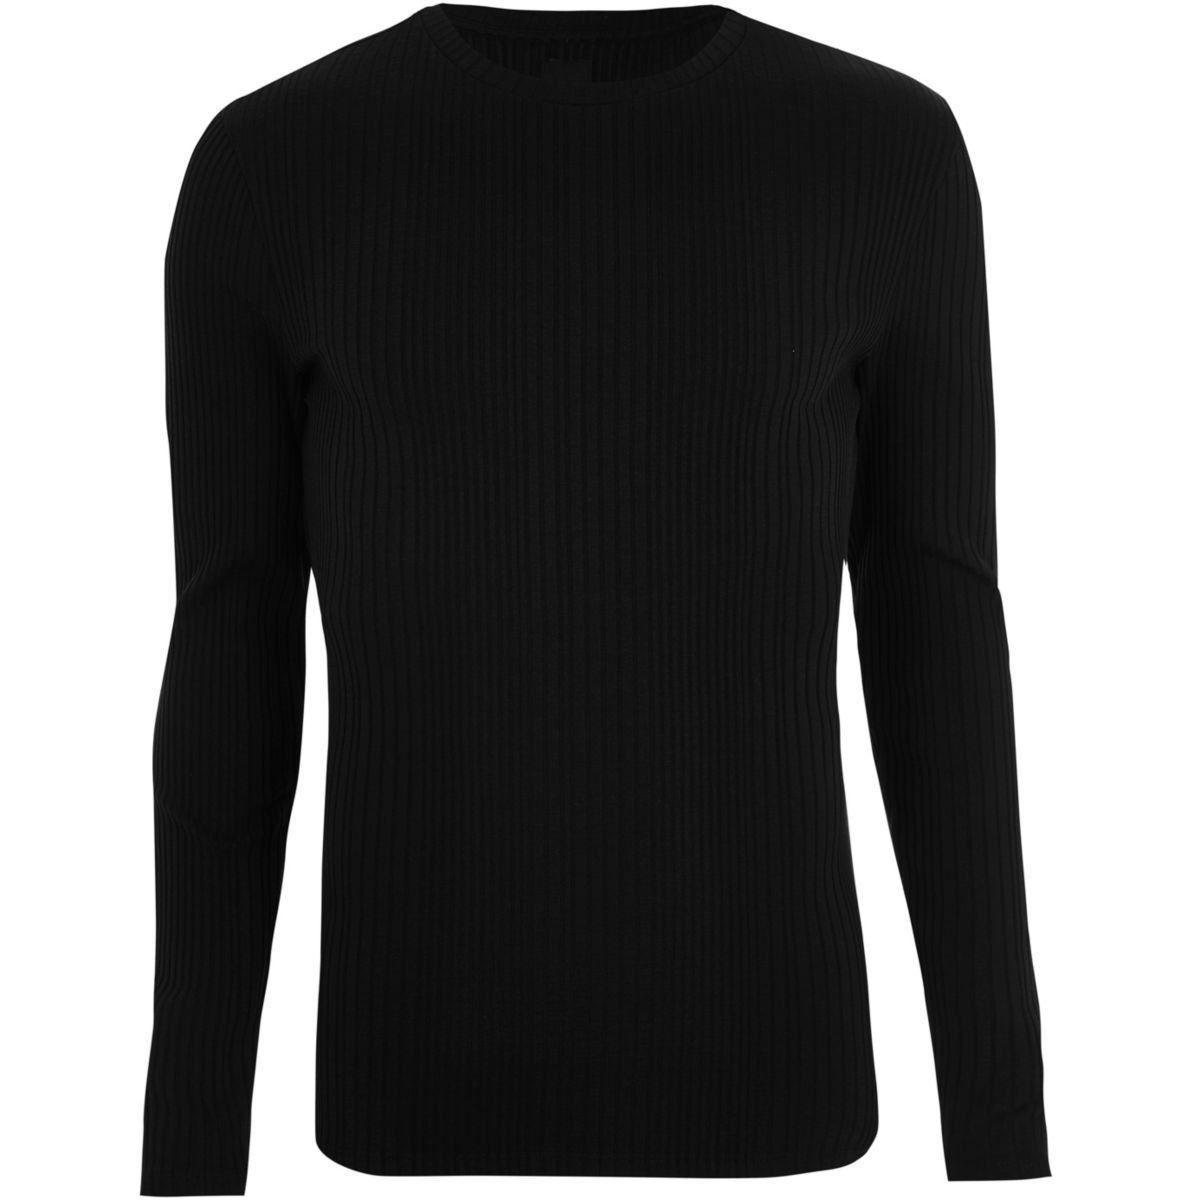 Schwarzes, langärmliges Strick-T-Shirt